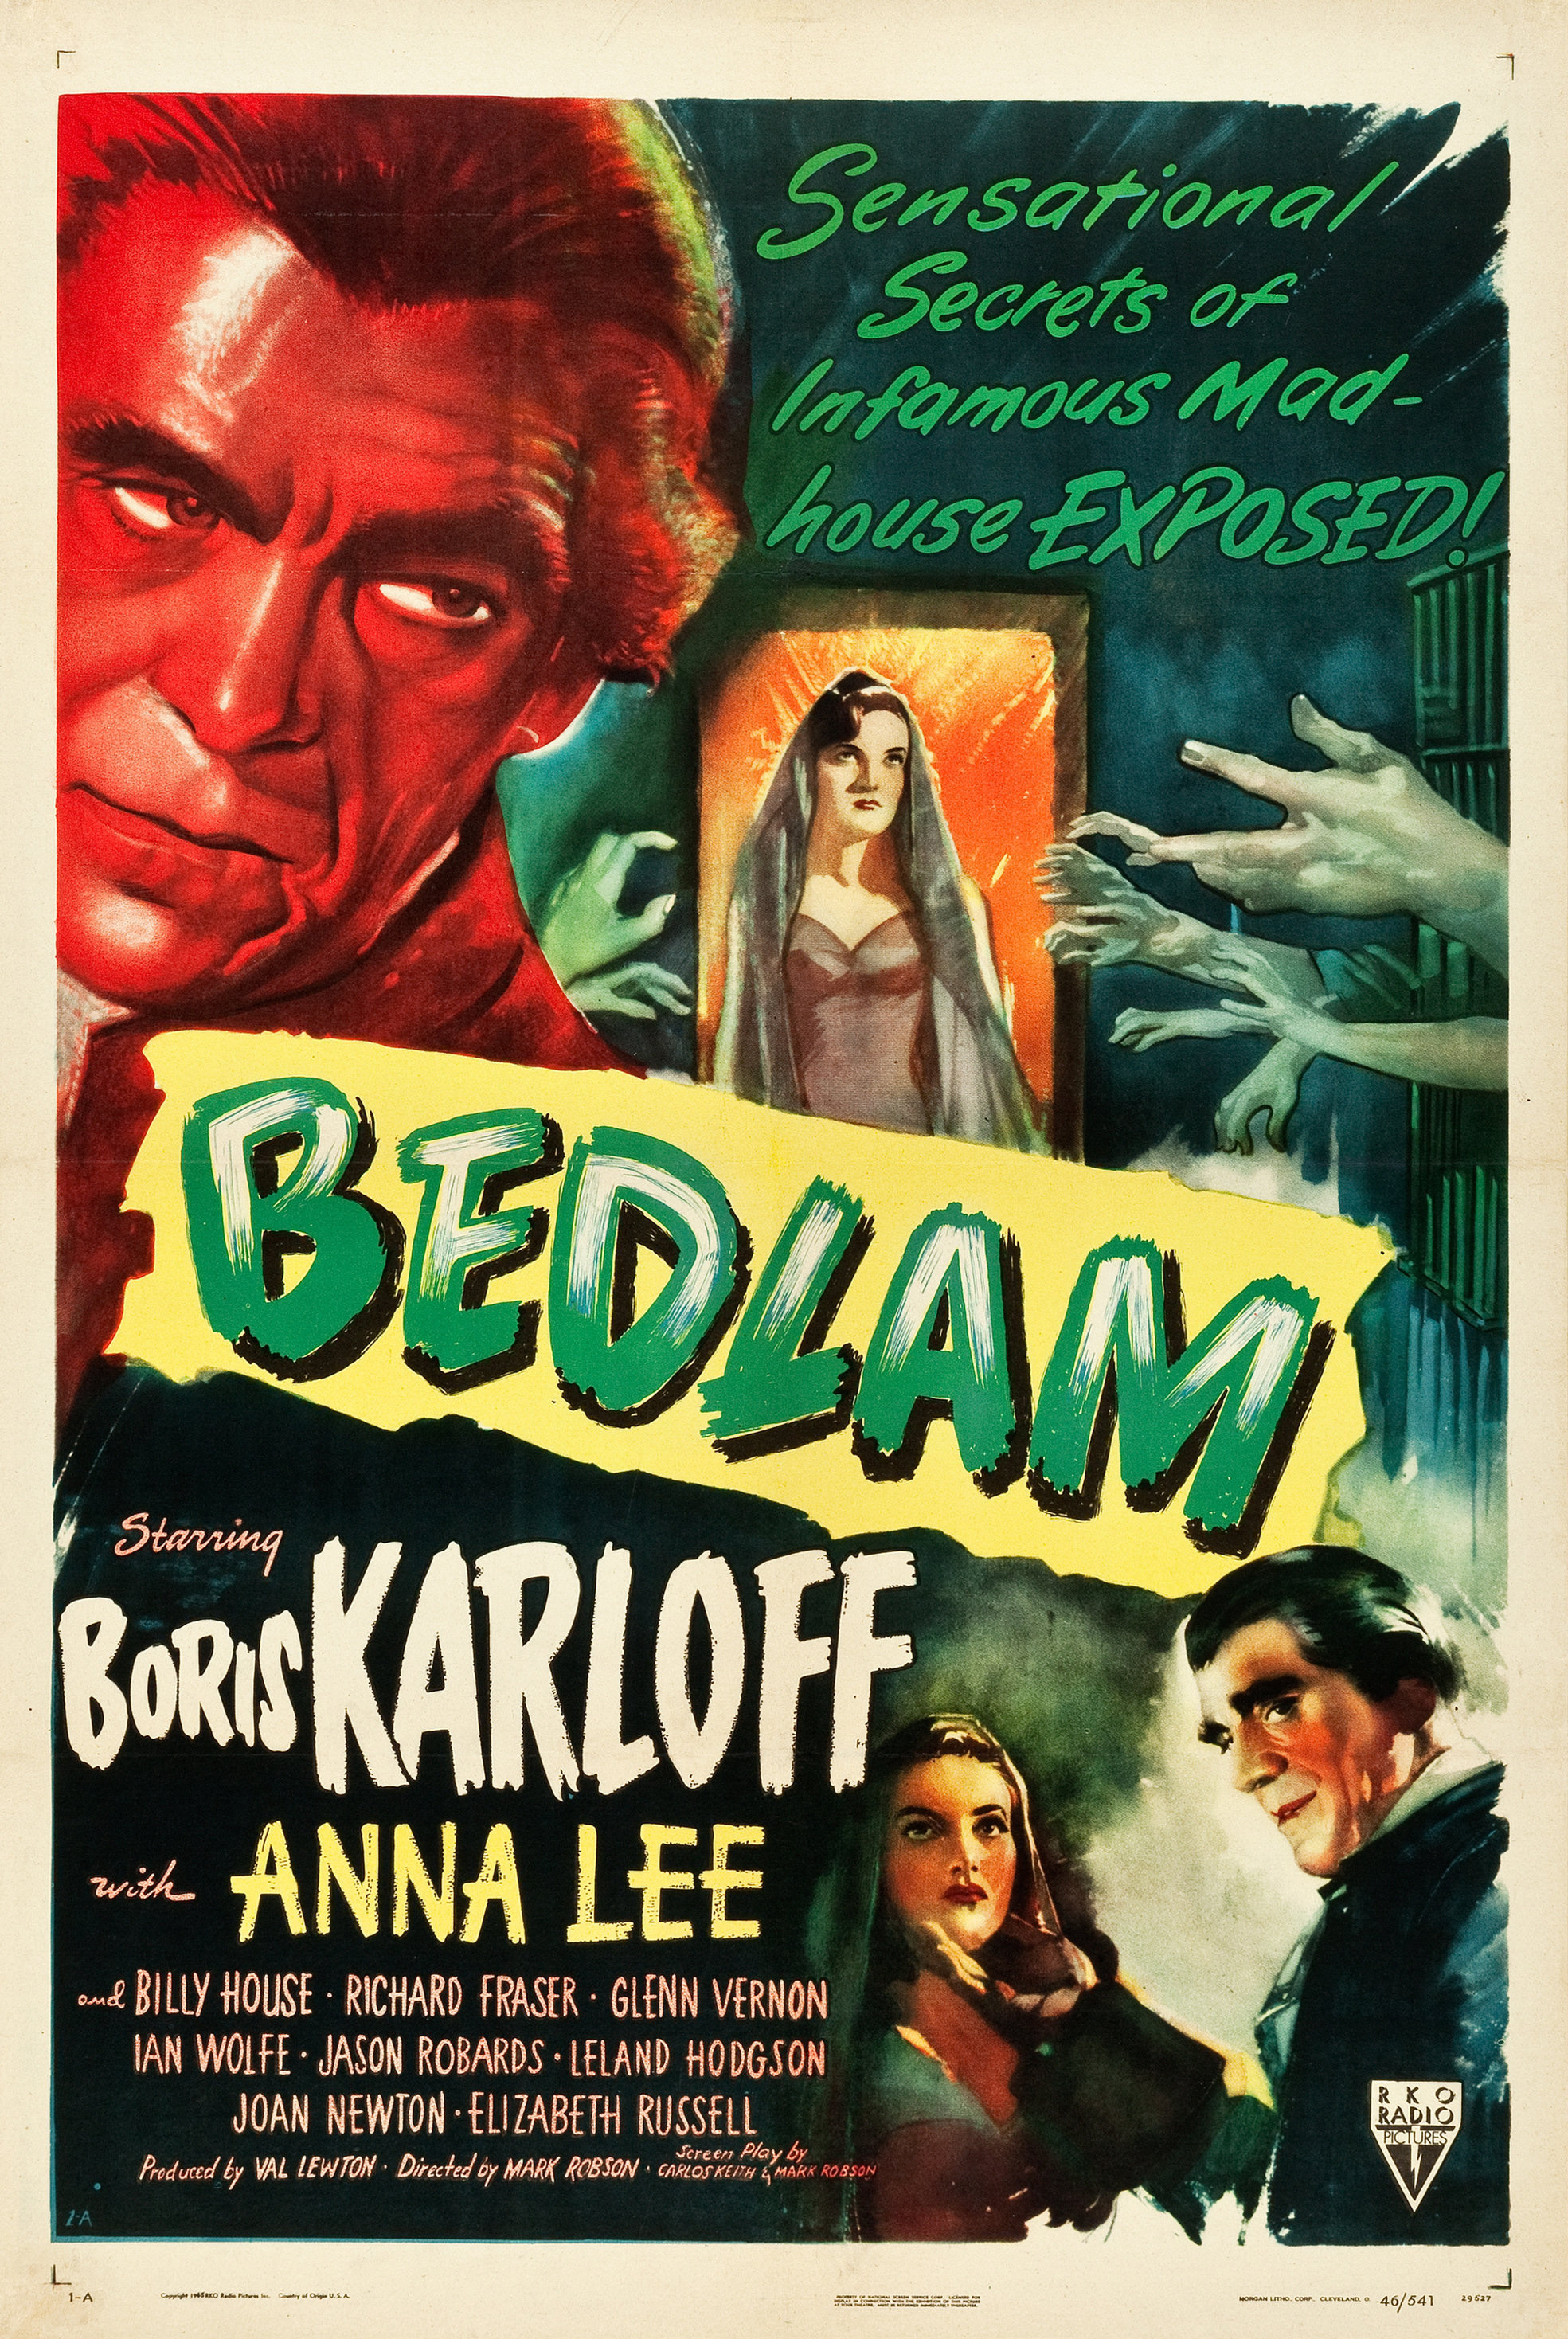 Boris Karloff Horror movie poster print 1944 The Curse of the Cat People